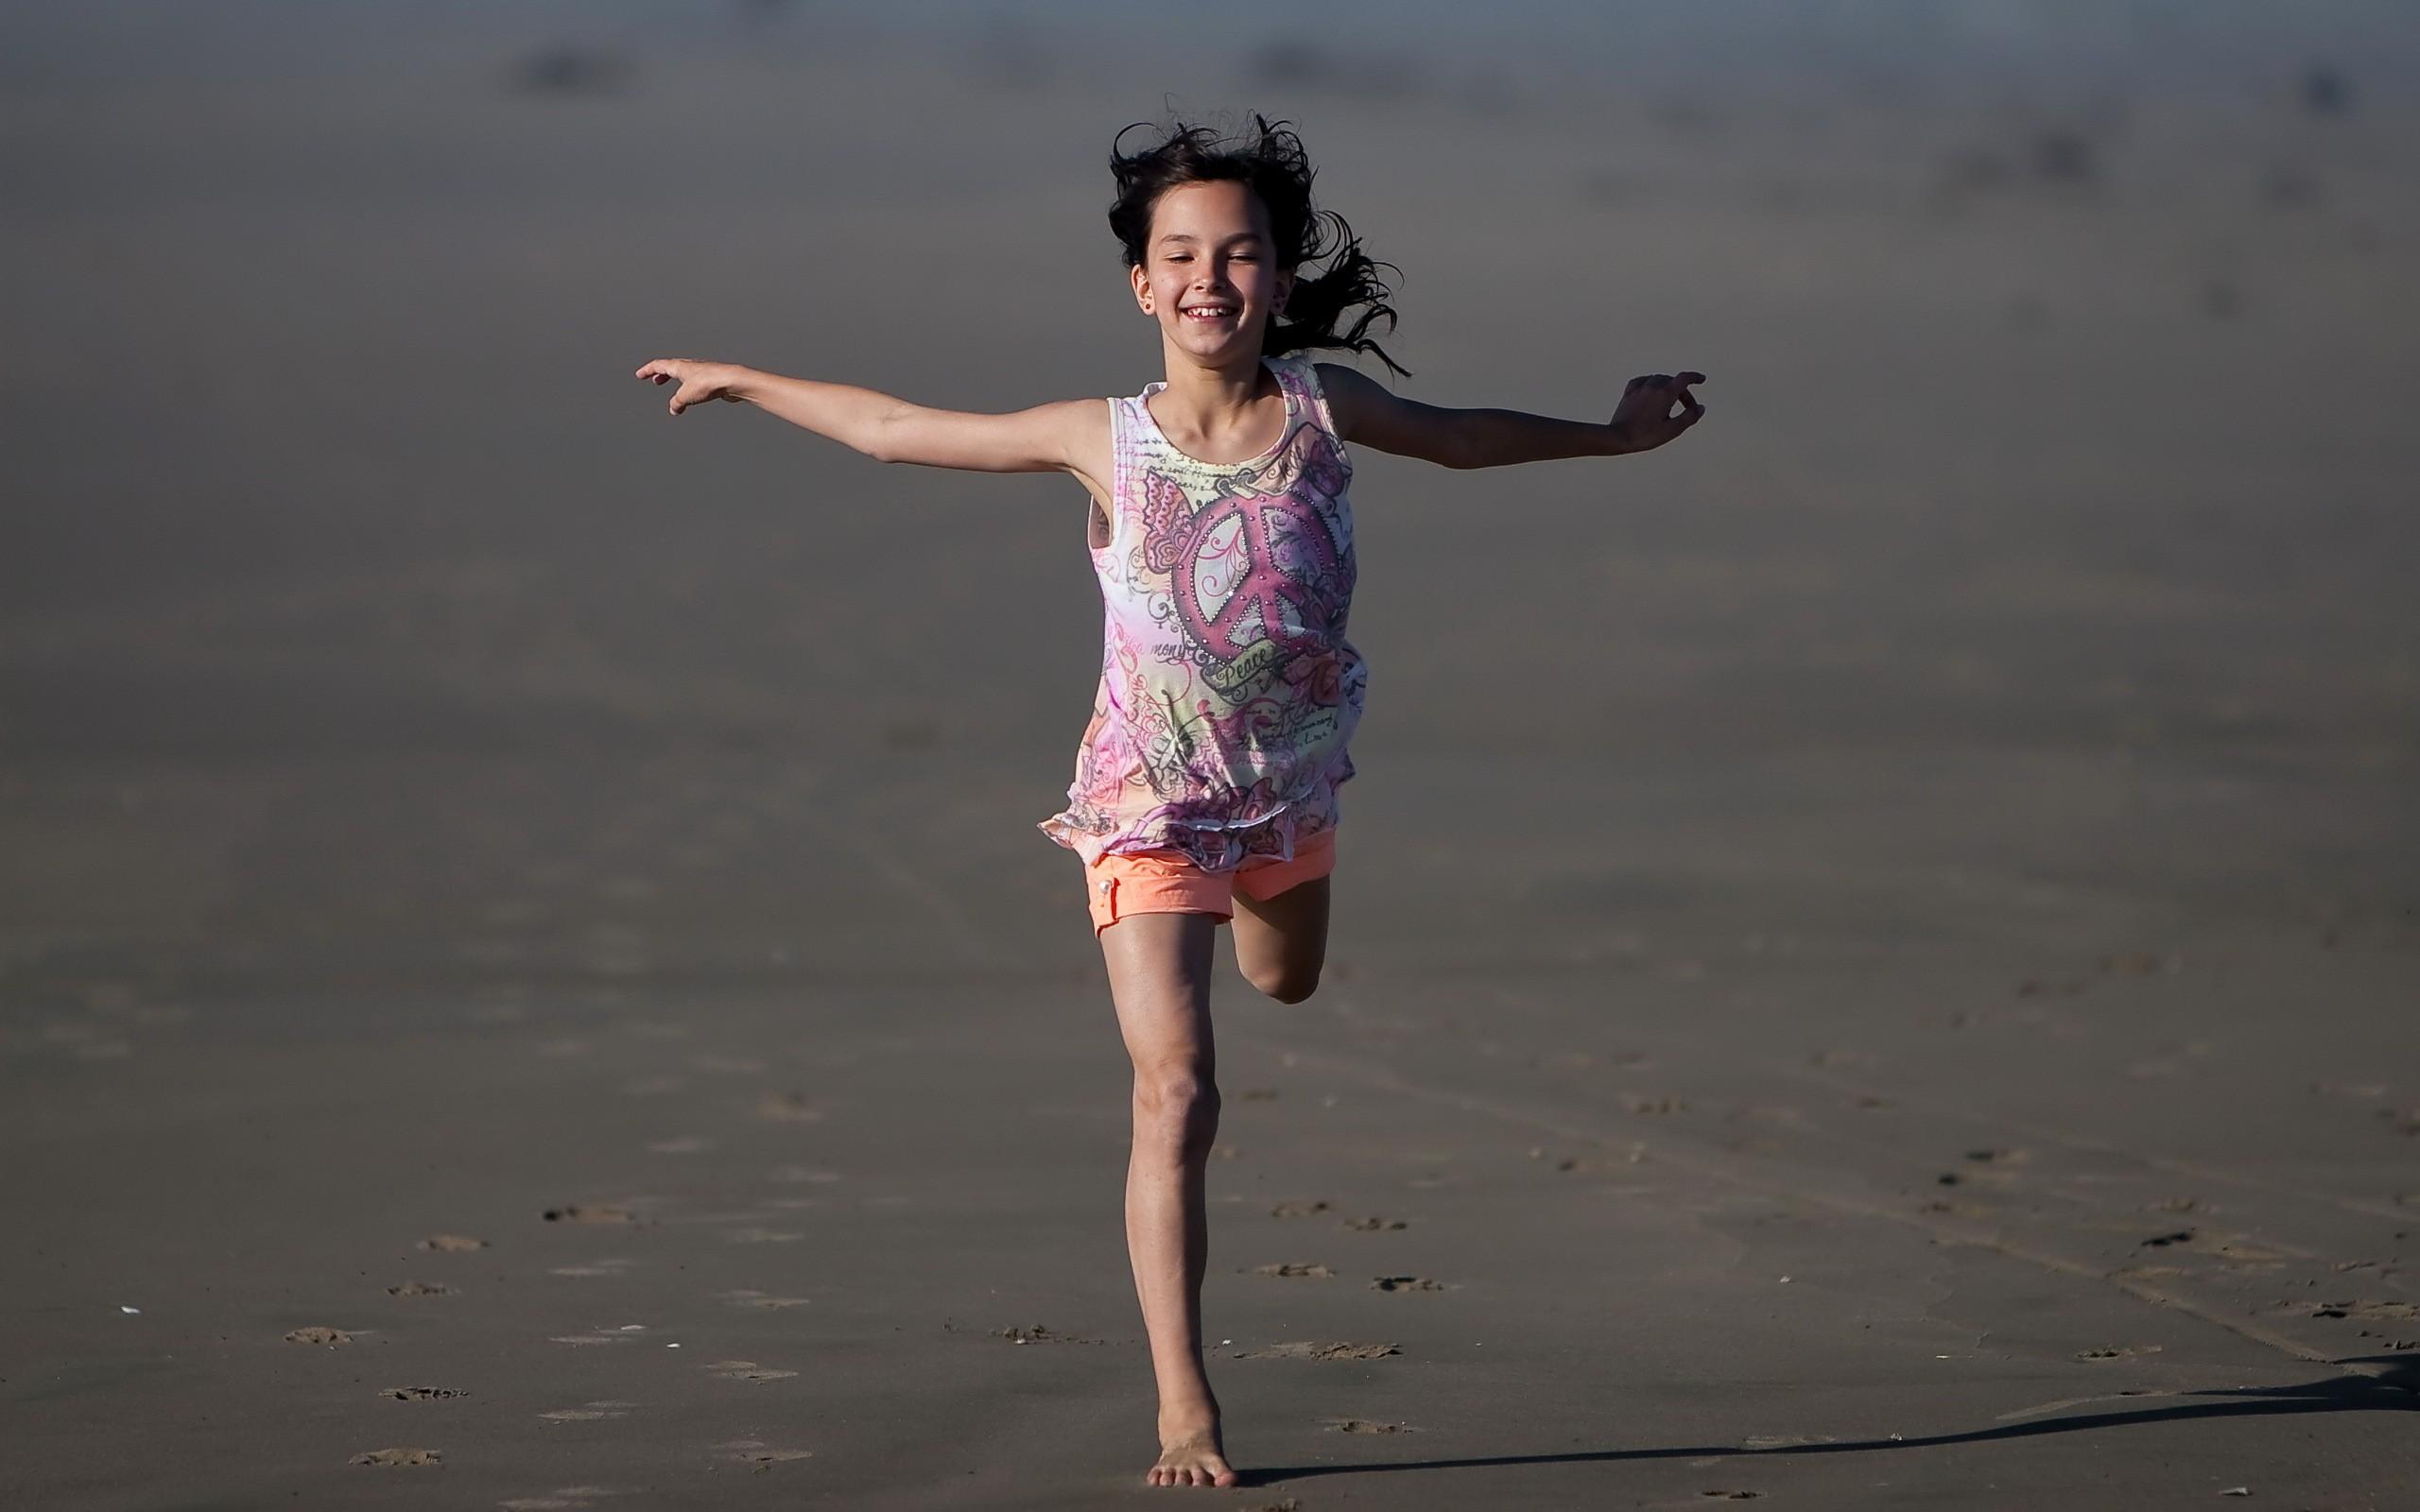 Niña en la playa - 2560x1600